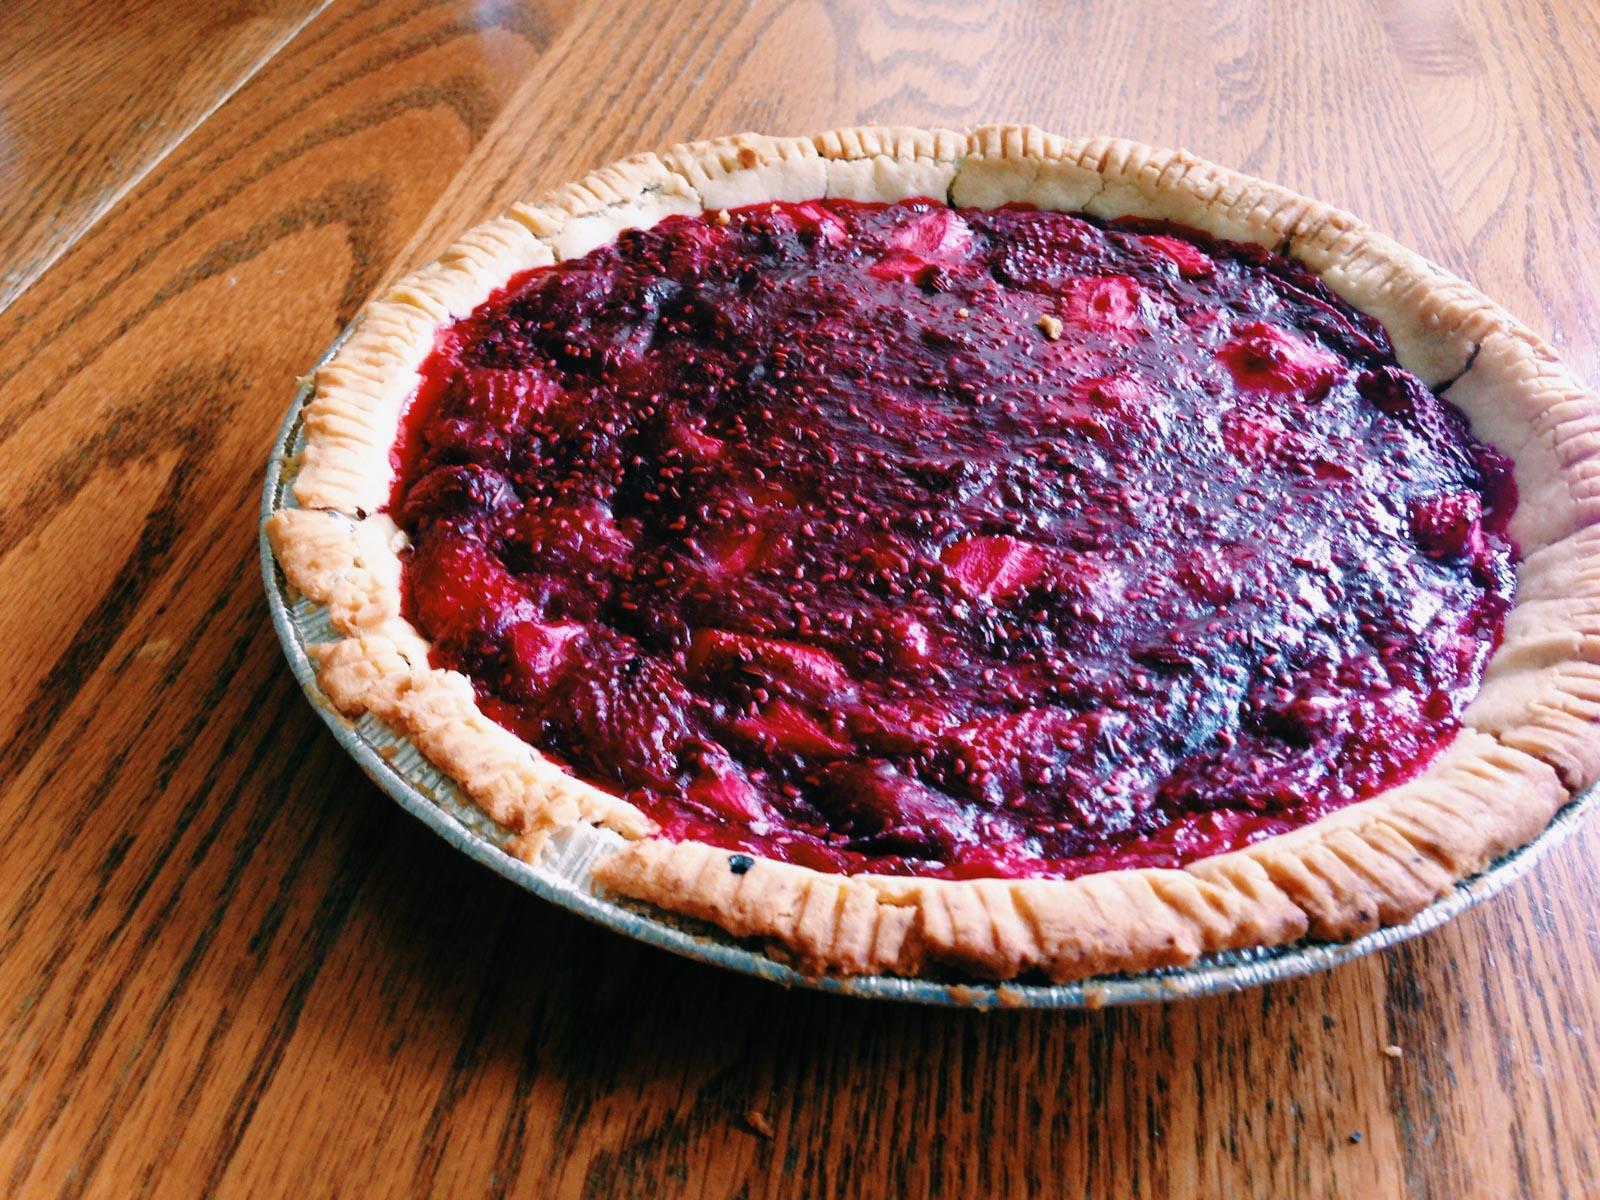 Sad crumbly gf pie attempt